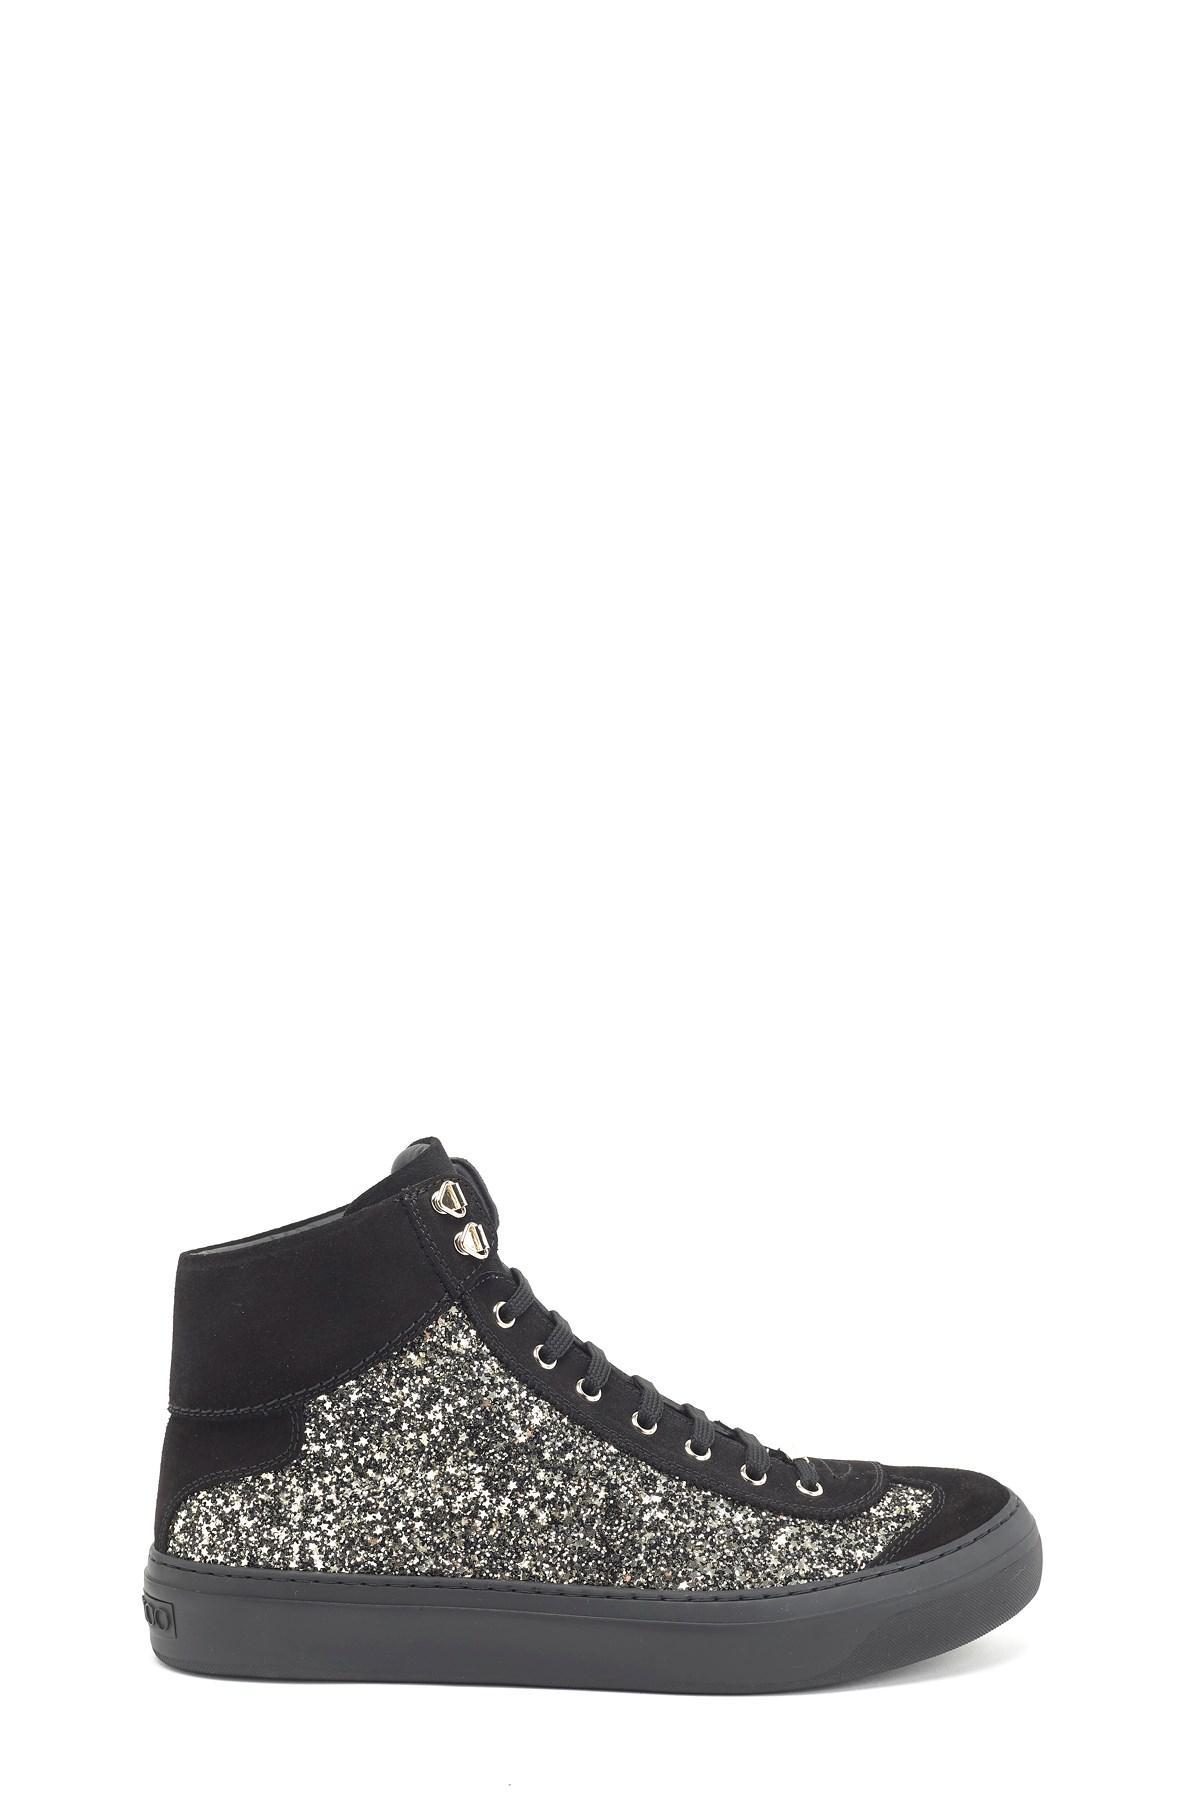 2a3780d0d35e Jimmy Choo. Men s Black  argyle  Sneakers.  514 From Julian Fashion ...